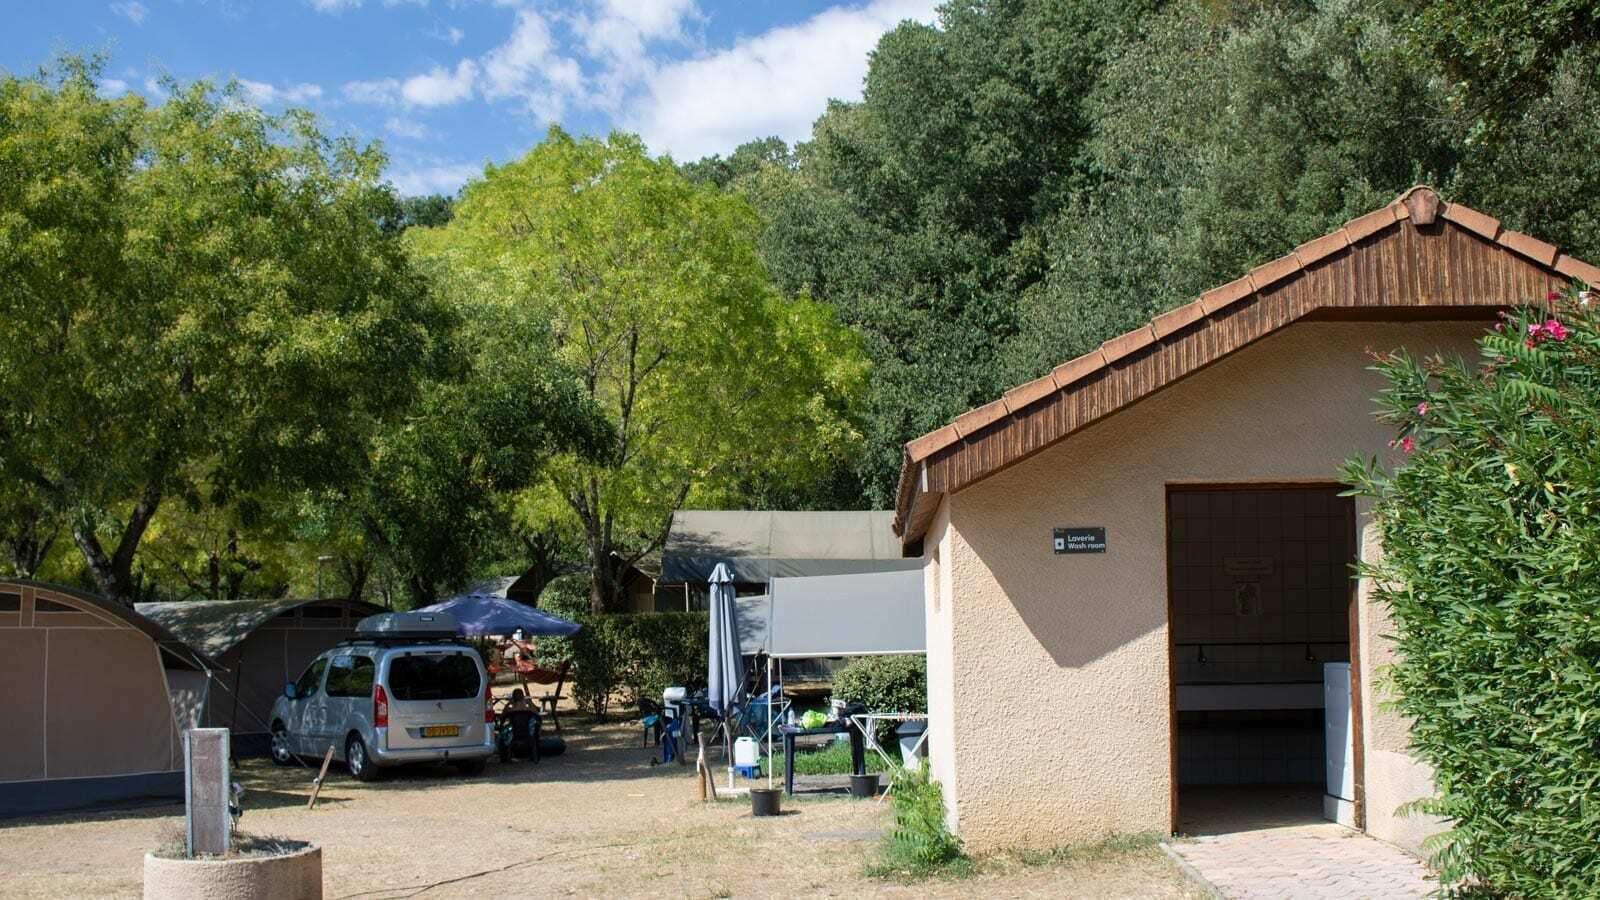 La Garenne | Luxe Sanitär XL 6 Pers.